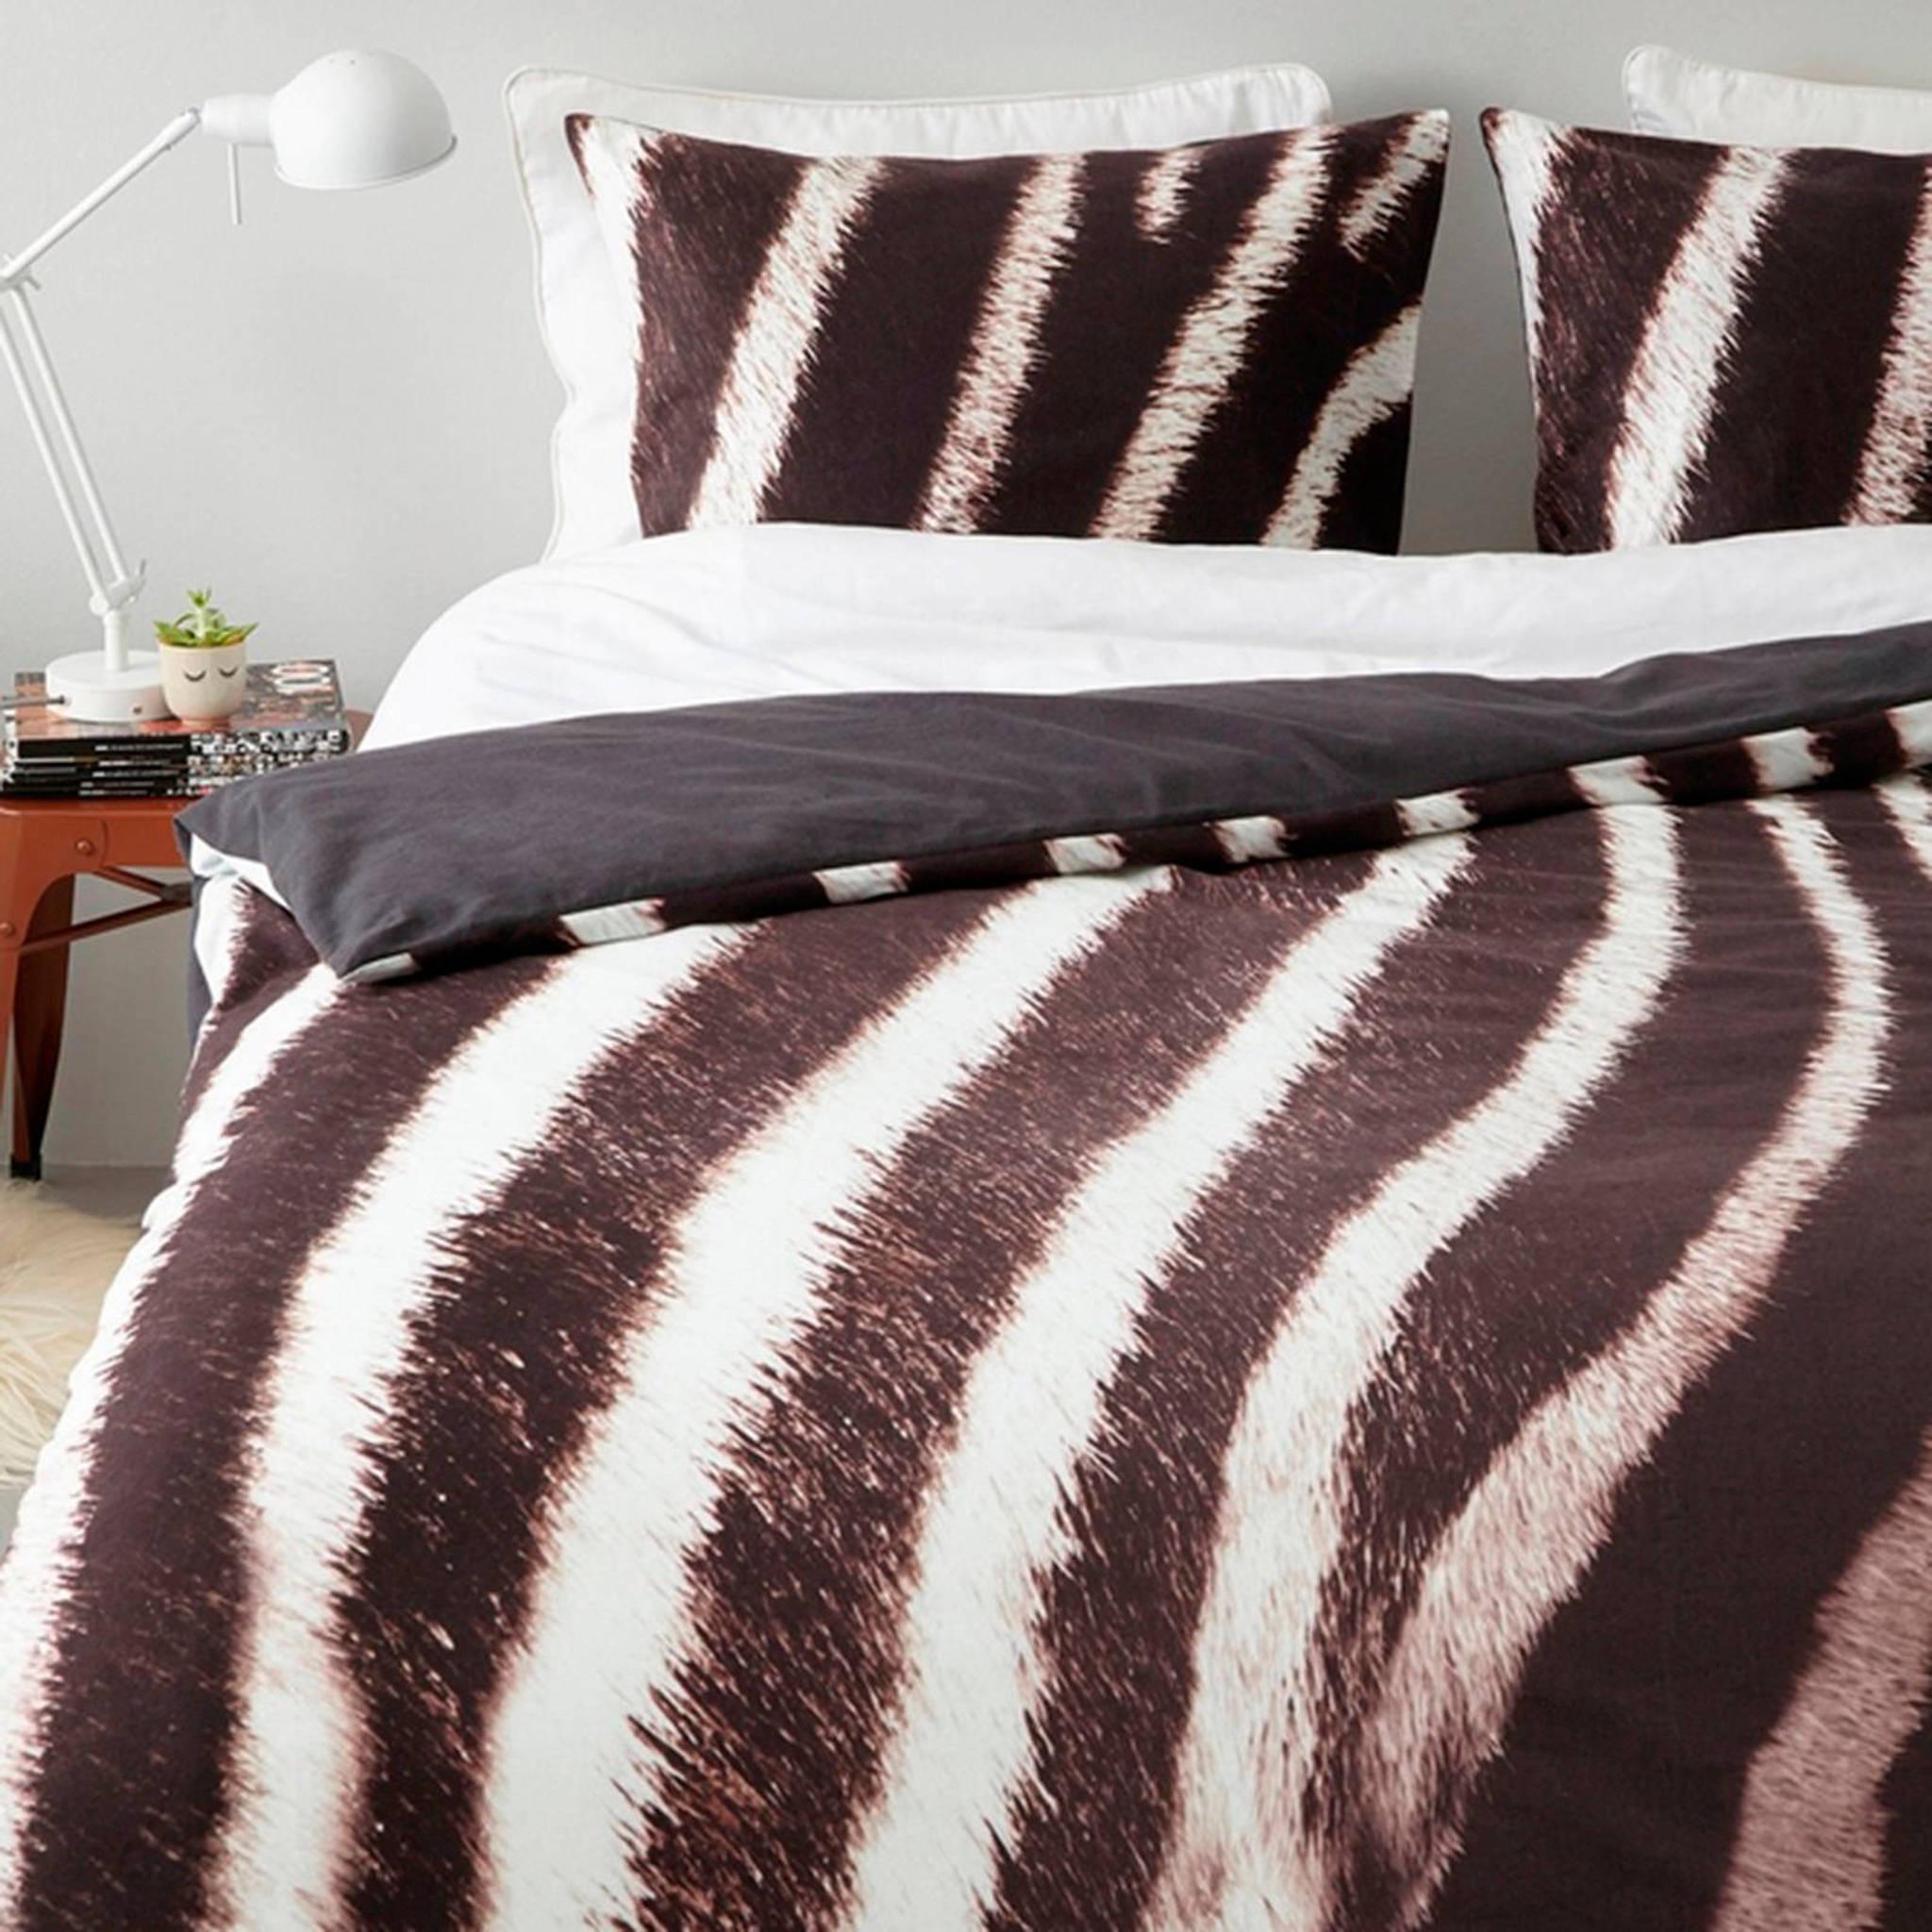 essenza flanellen dekbedovertrek lits jumeaux bruin